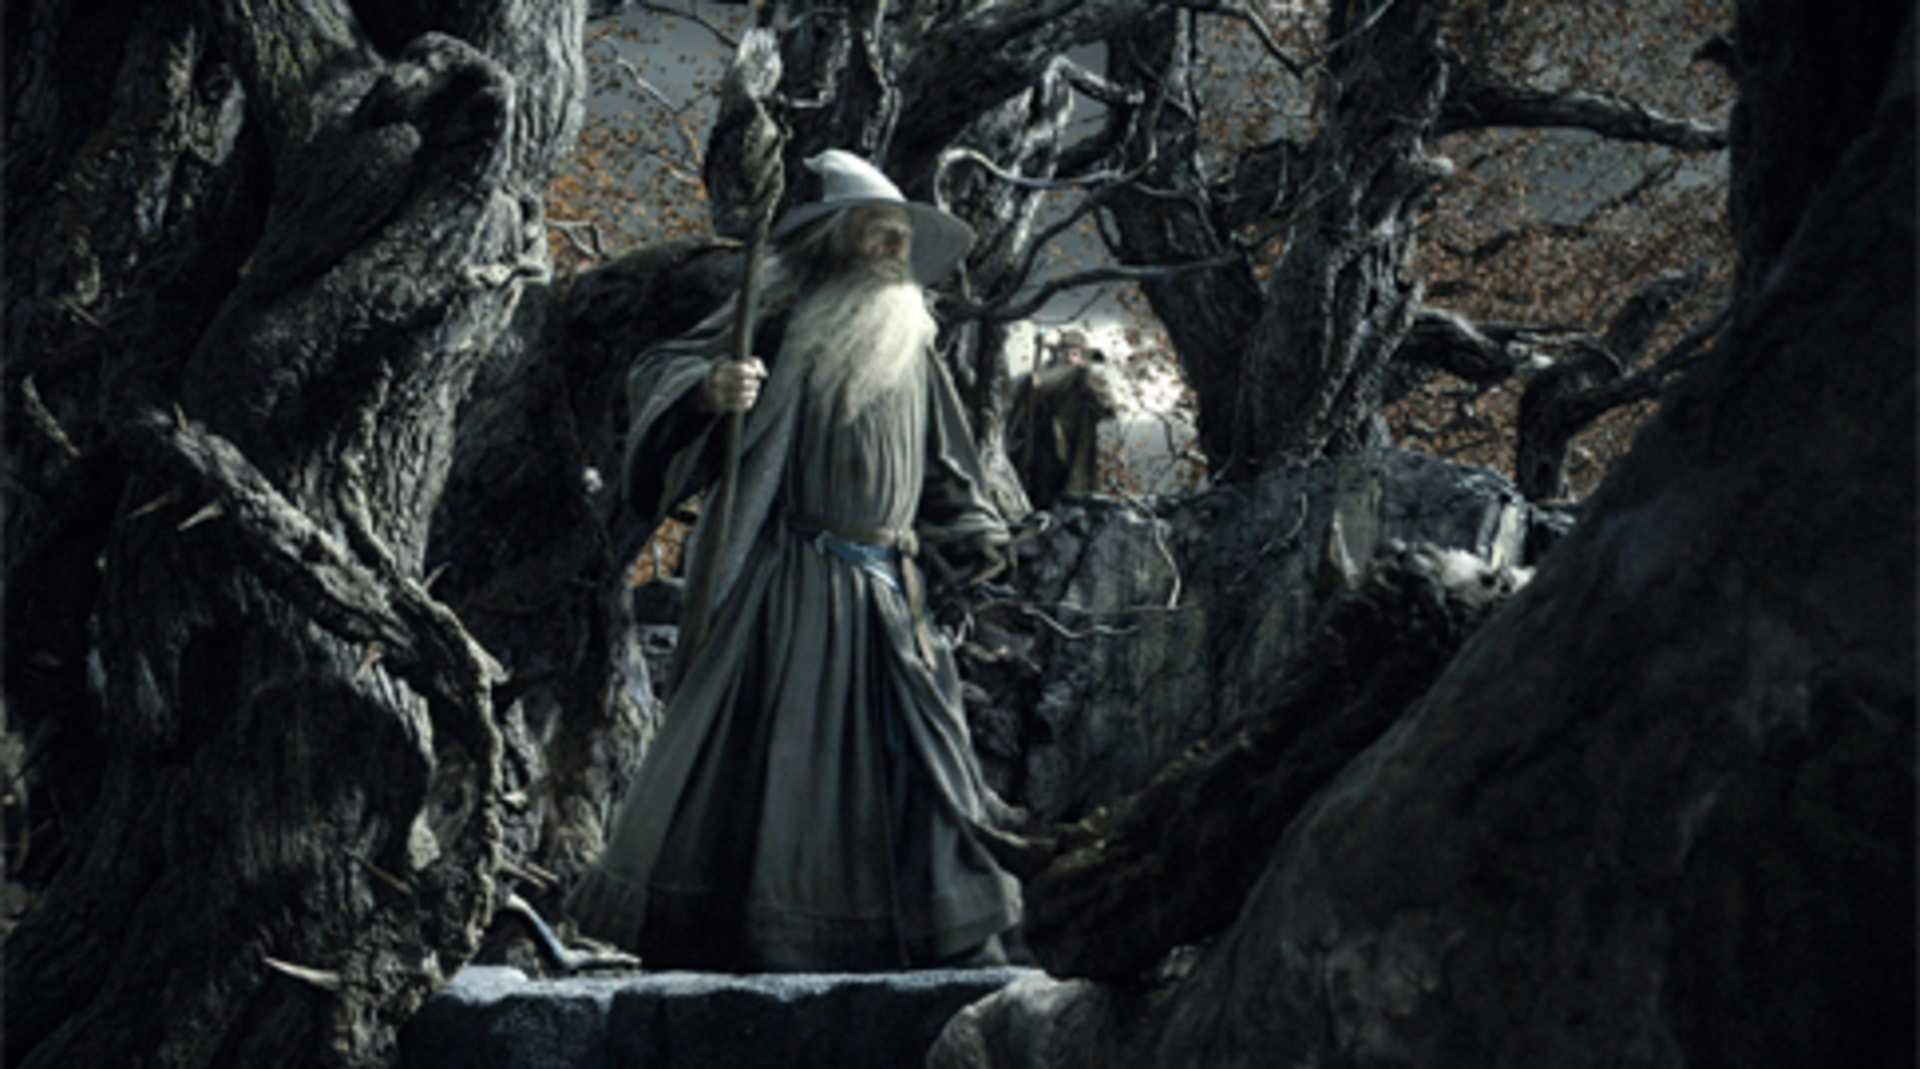 The Hobbit: The Desolation of Smaug - Image 21